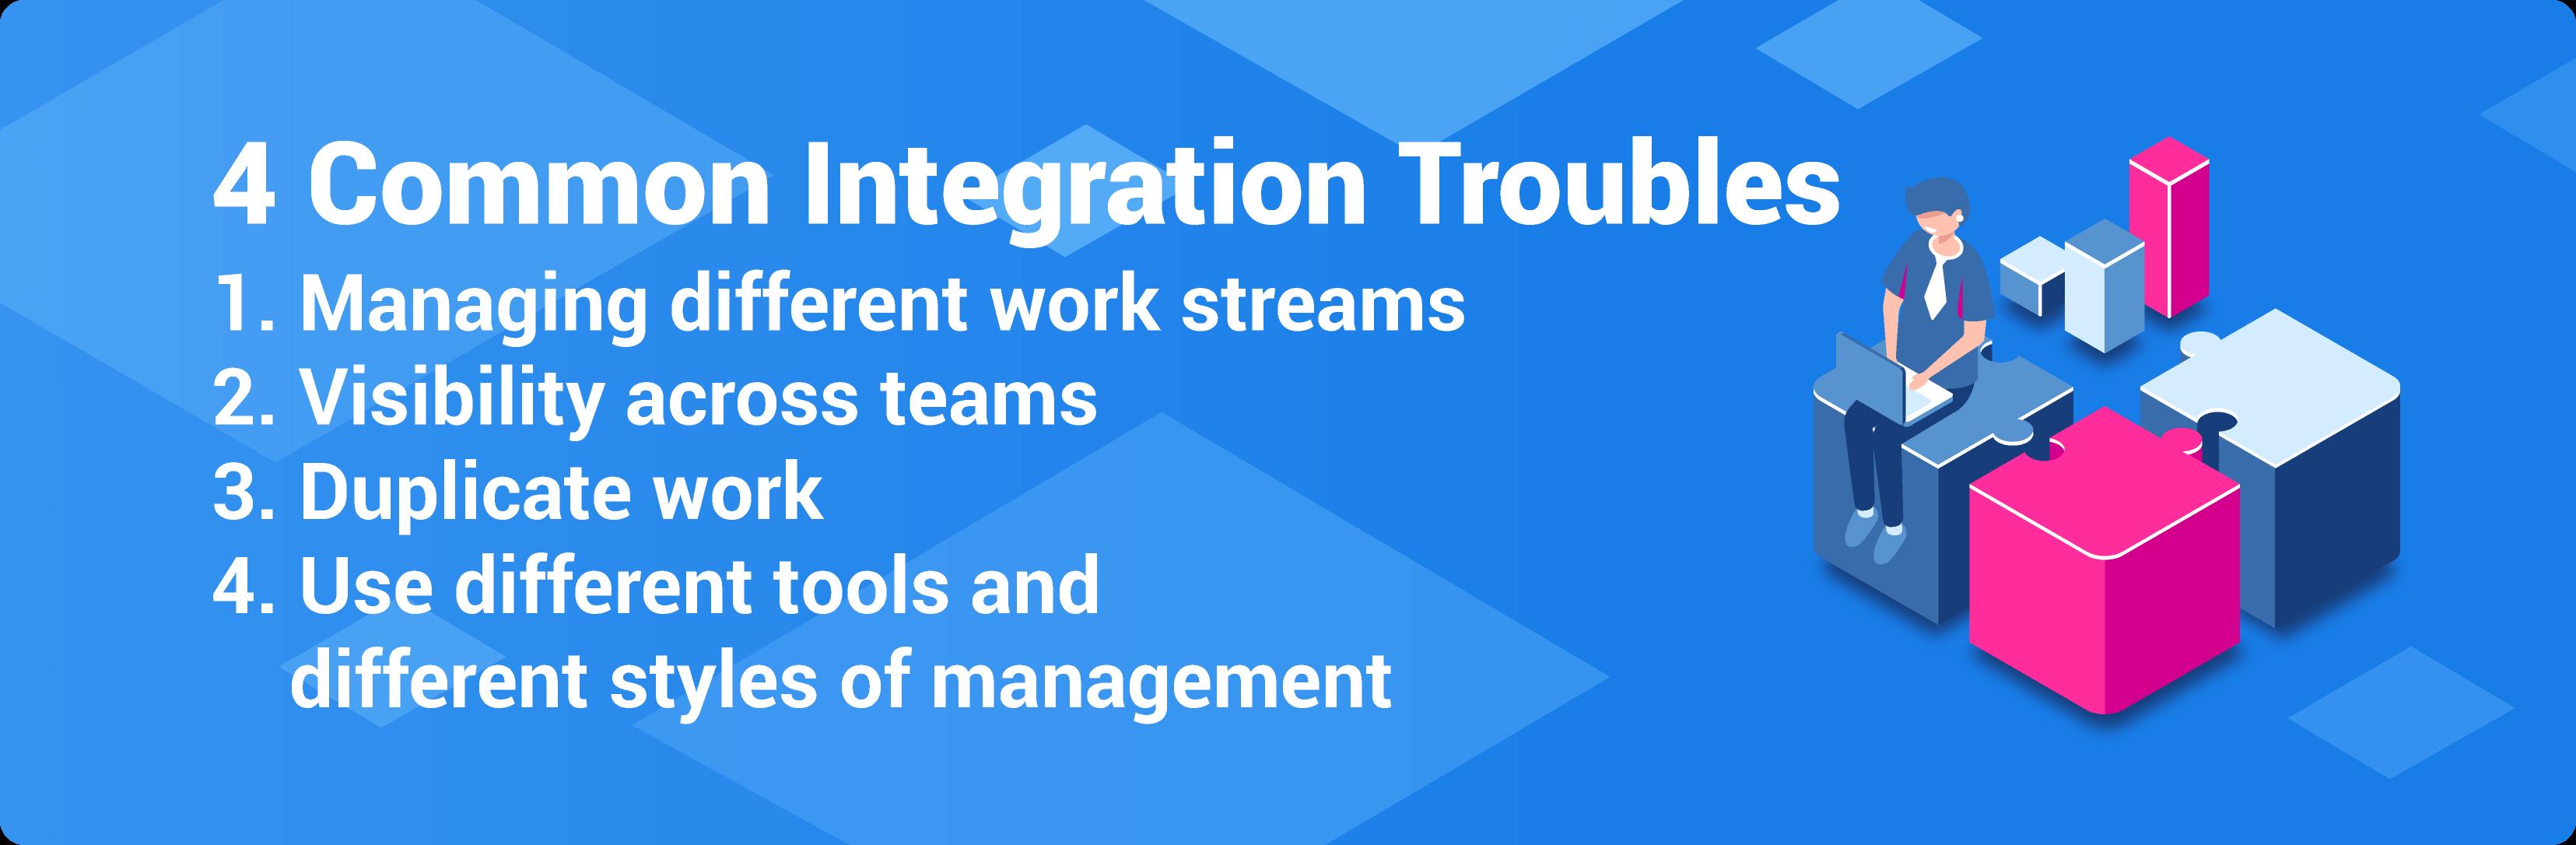 common integration problems